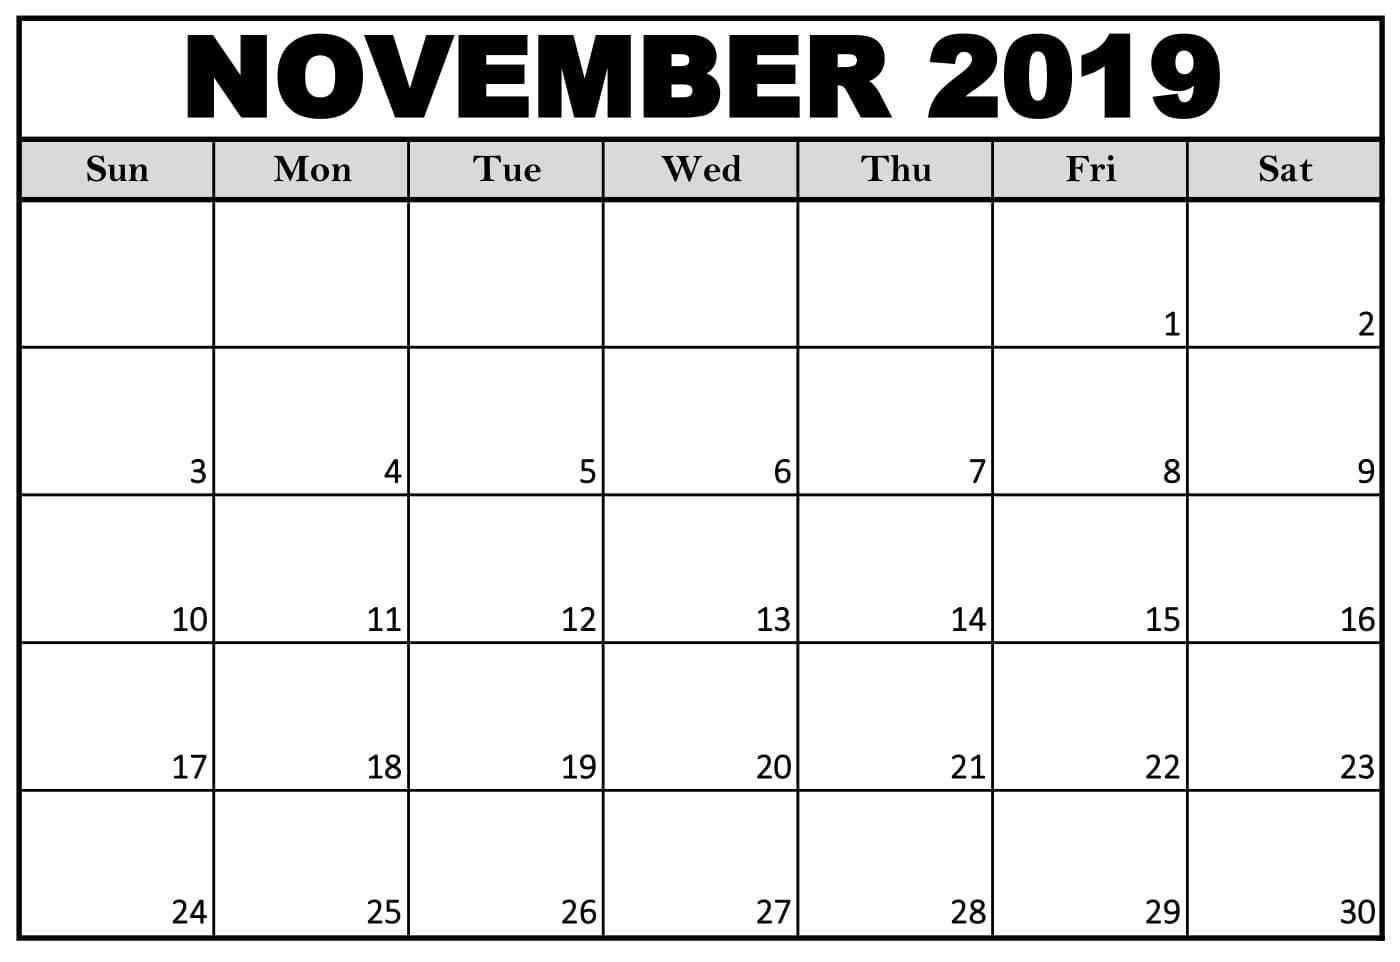 November 2019 Calendar Nz (New Zealand) Holidays | Free